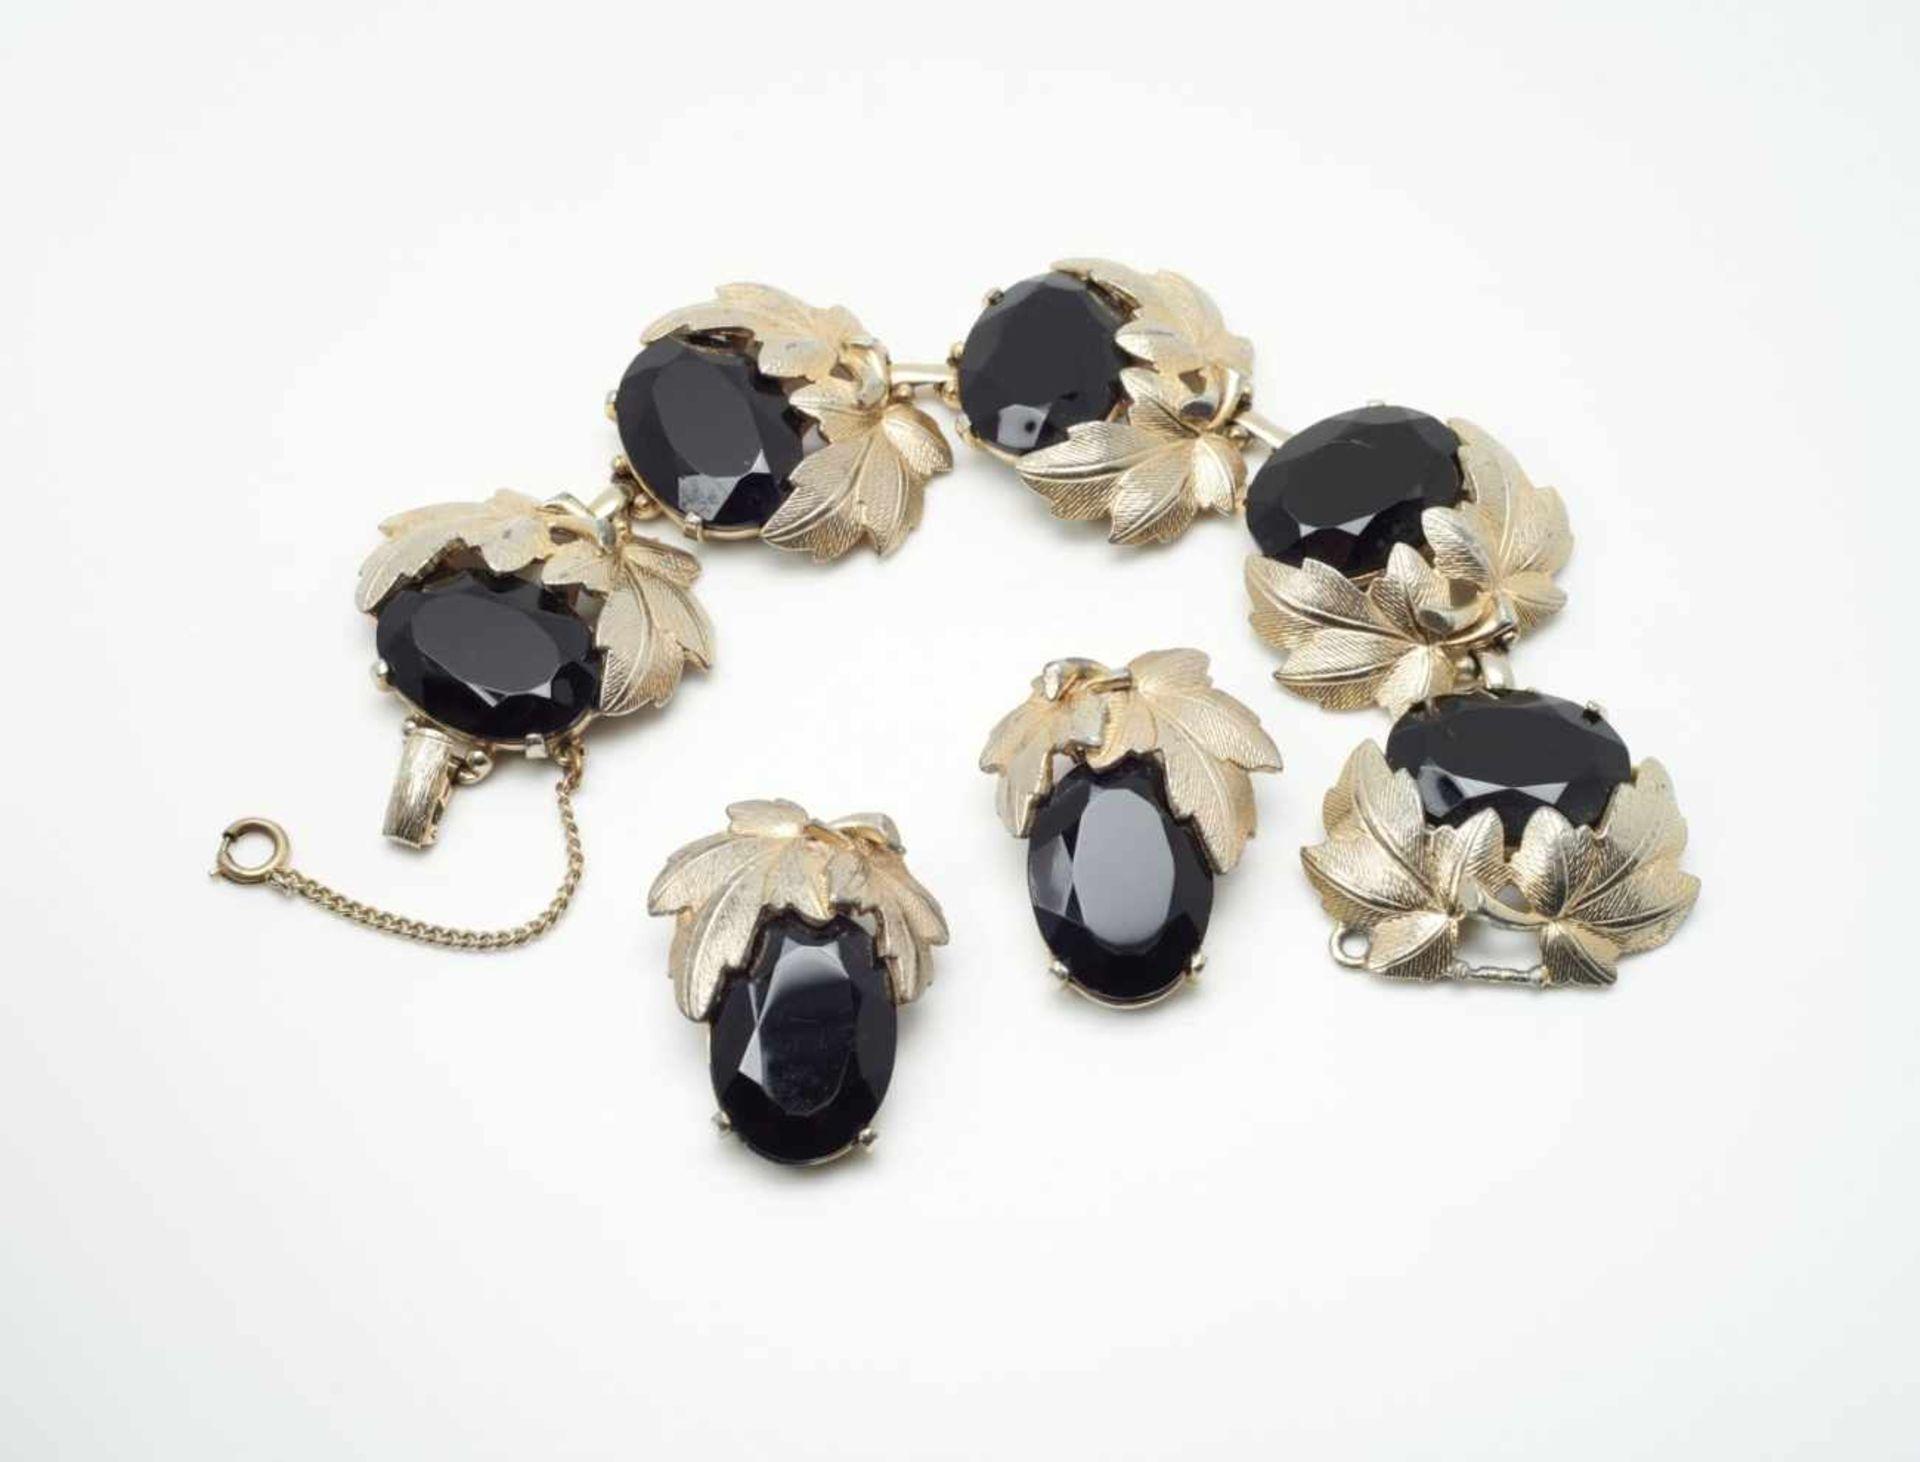 Two-piece Jewellery Set: Bracelet and Clip-on EarringsElsa Schiaparelli for Schiaparelli Inc., New